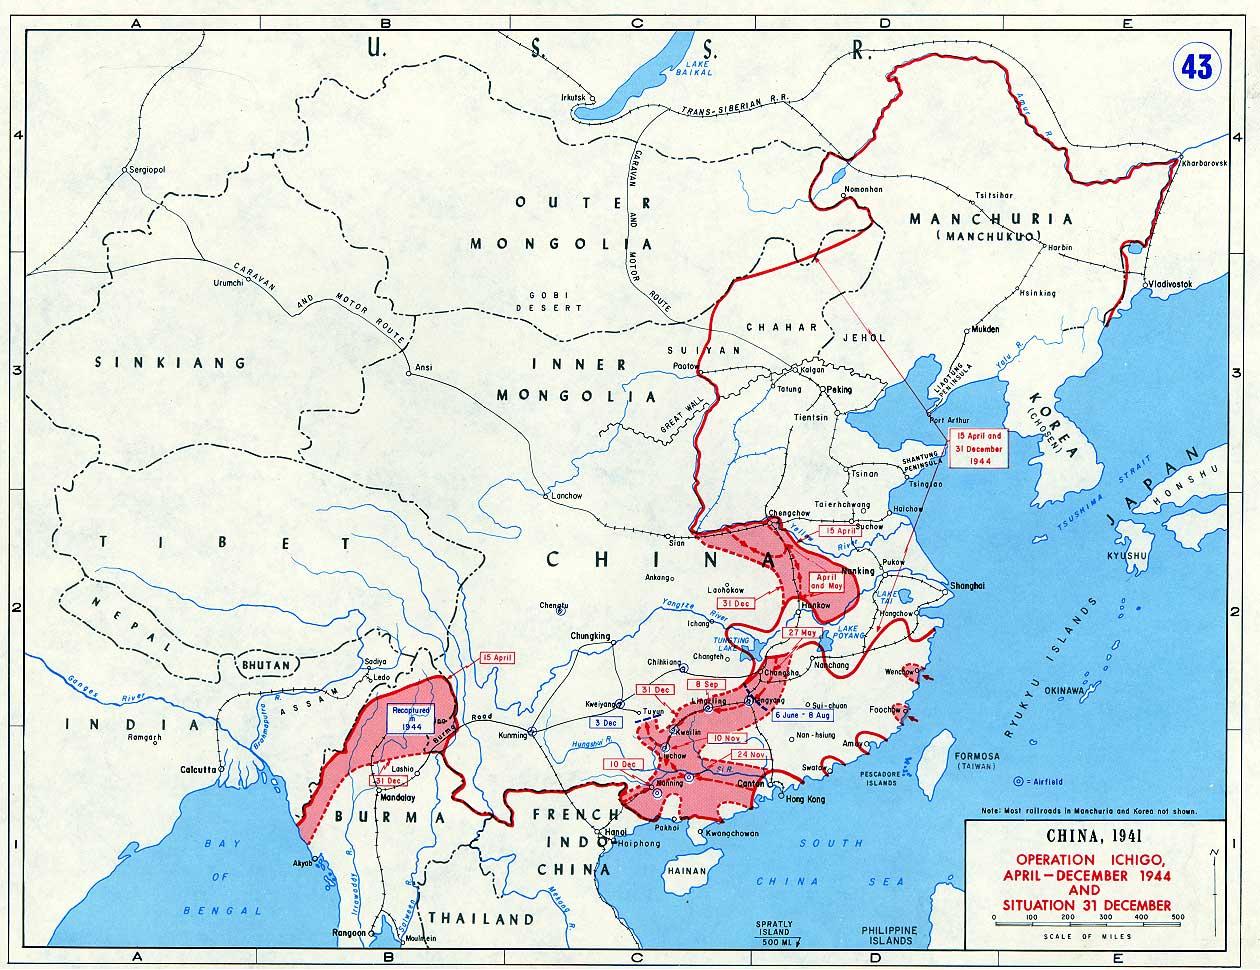 Image ww2 asia map 43g axis allies wiki fandom powered ww2 asia map 43g sciox Gallery